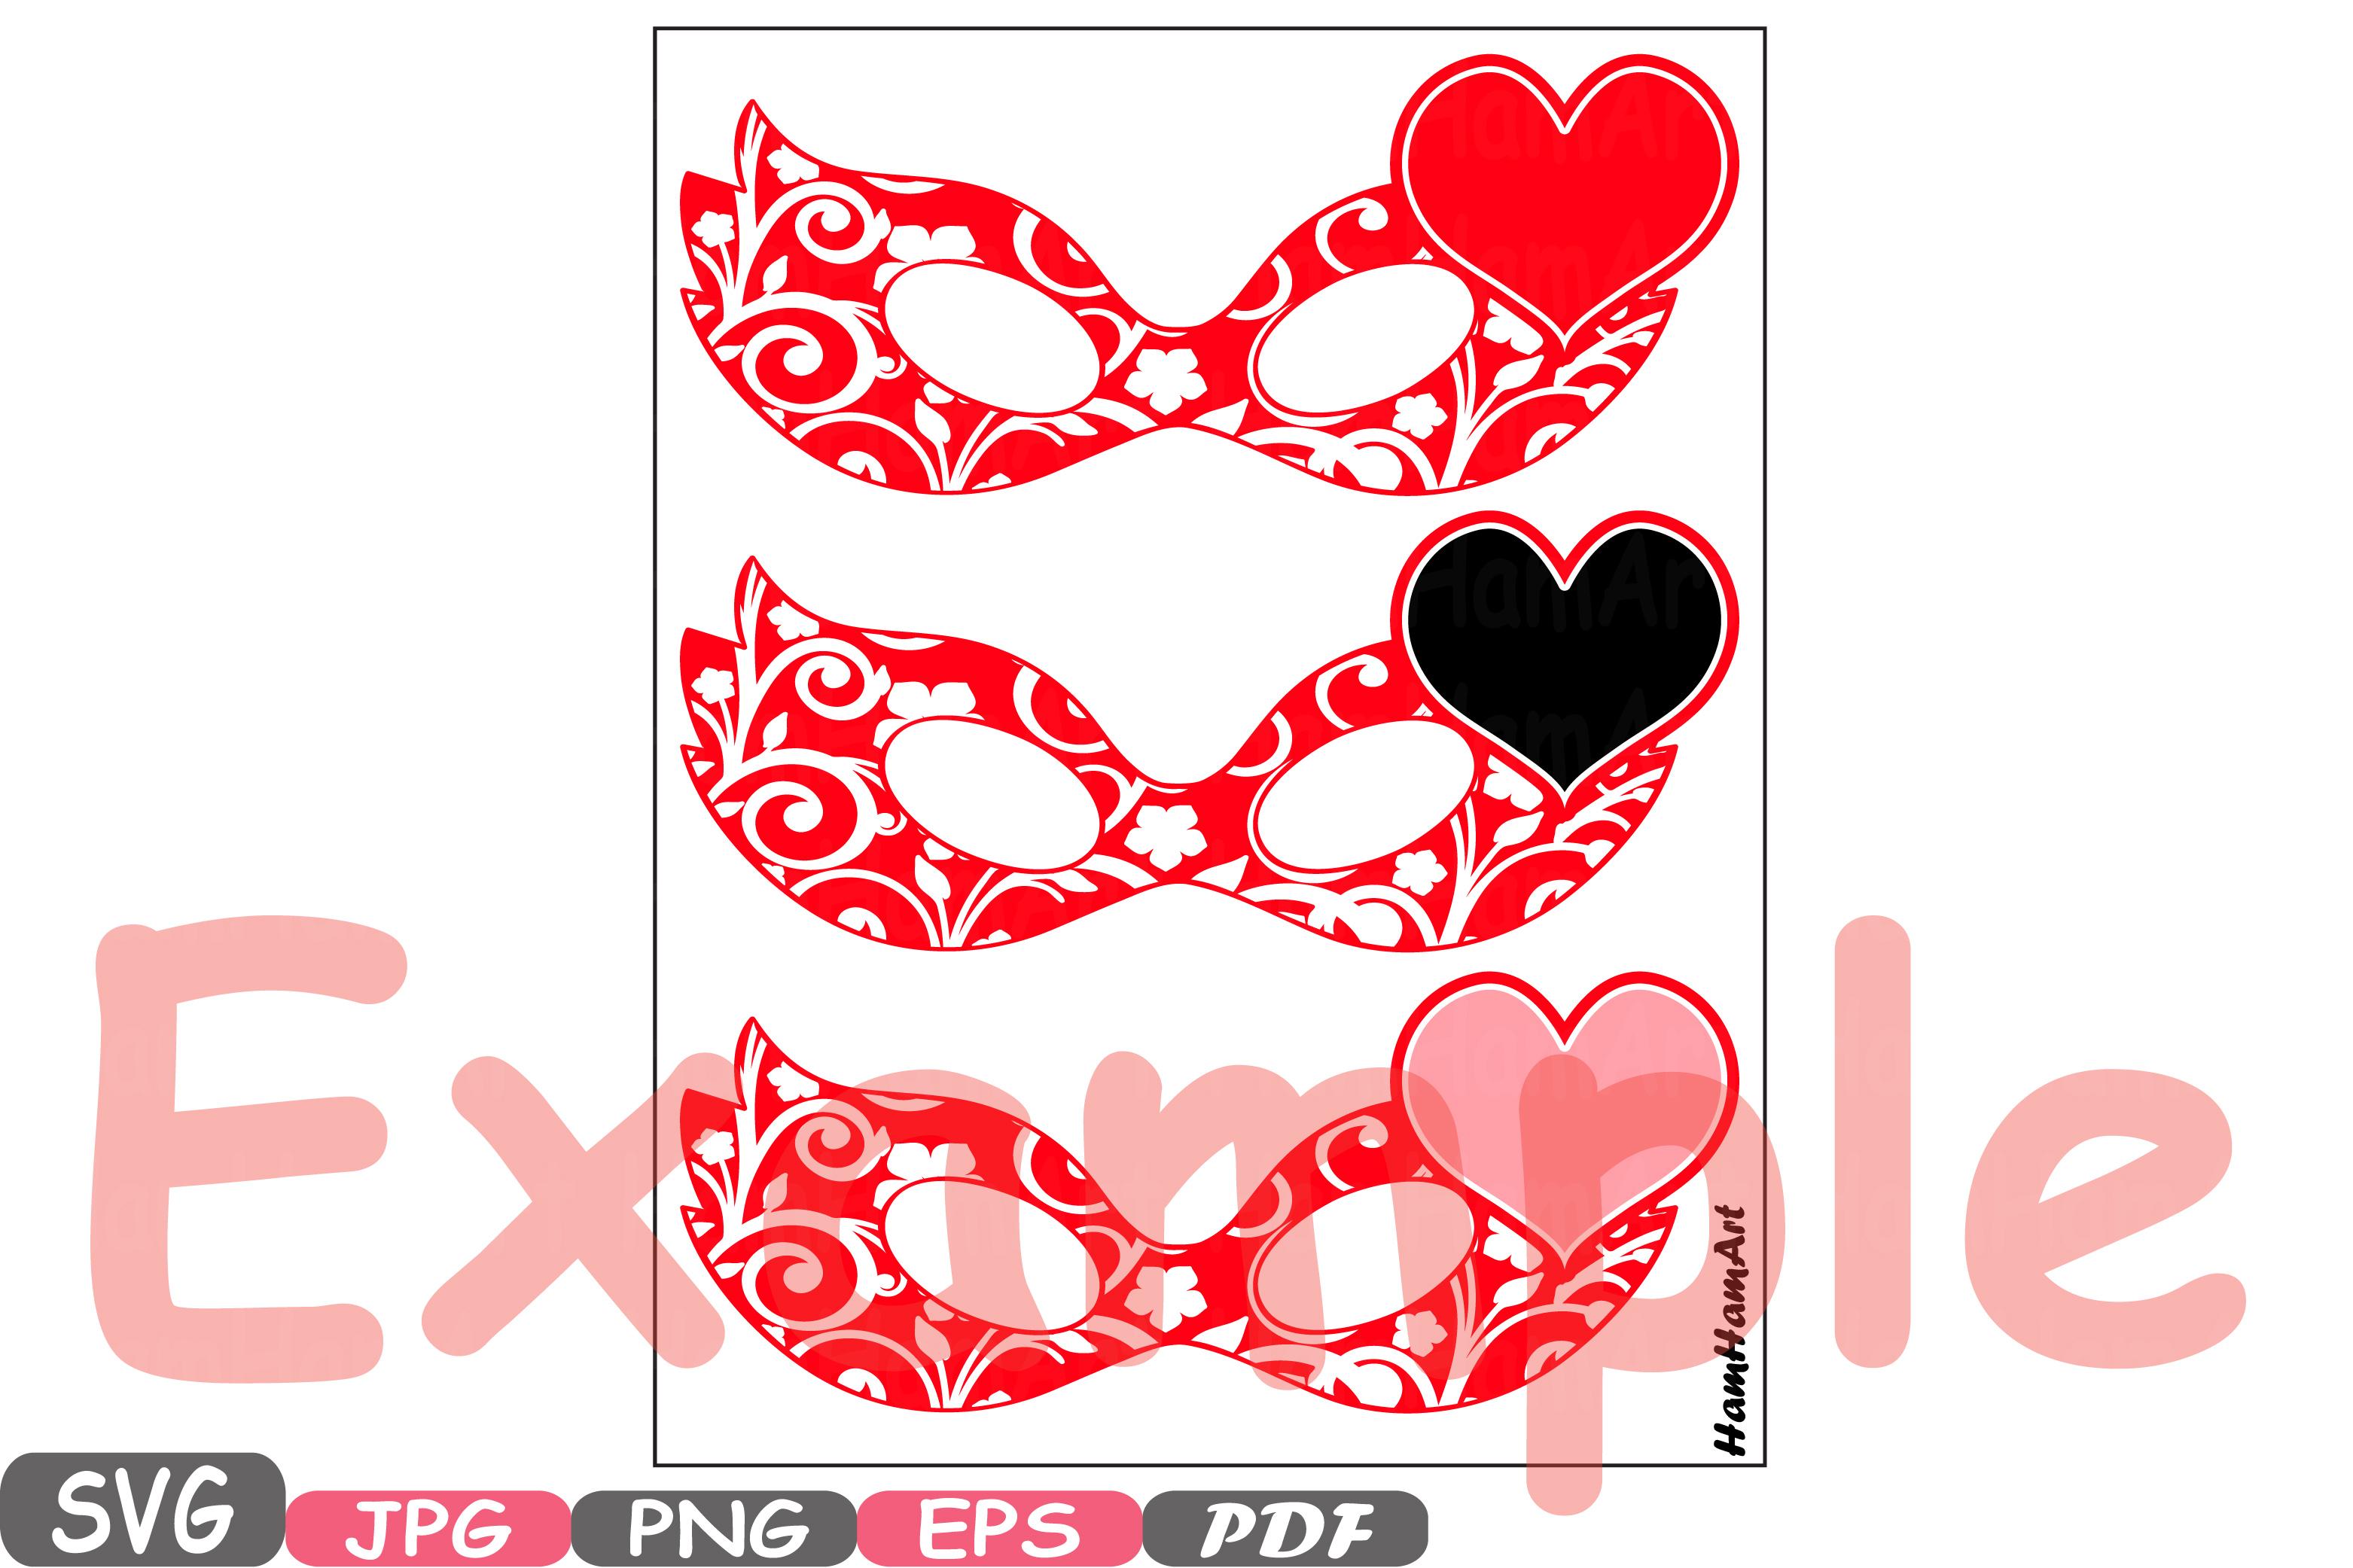 Wonderful Props Valentine's Day Mask Silhouette C | Design Bundles YG38